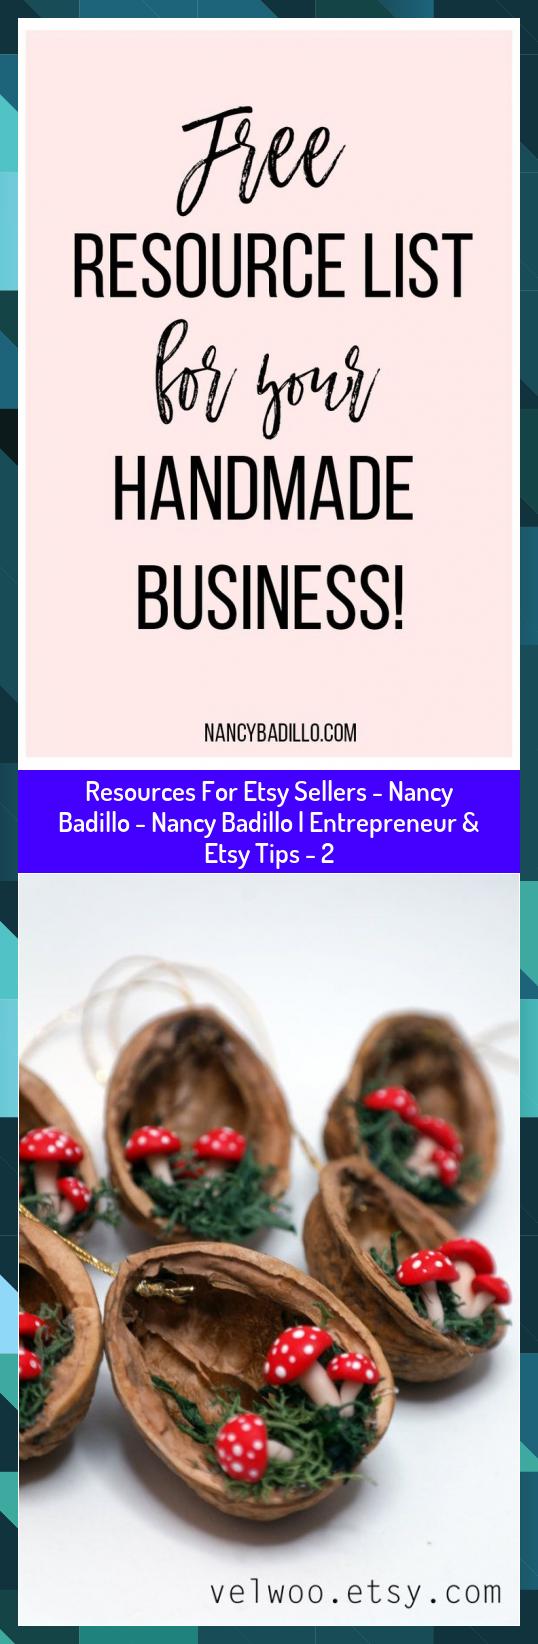 Resources For Etsy Sellers - Nancy Badillo - Nancy Badillo | Entrepreneur & Etsy Tips - 2 #Badillo #Entrepreneur #Etsy #Nancy #Resources #Sellers #Tips